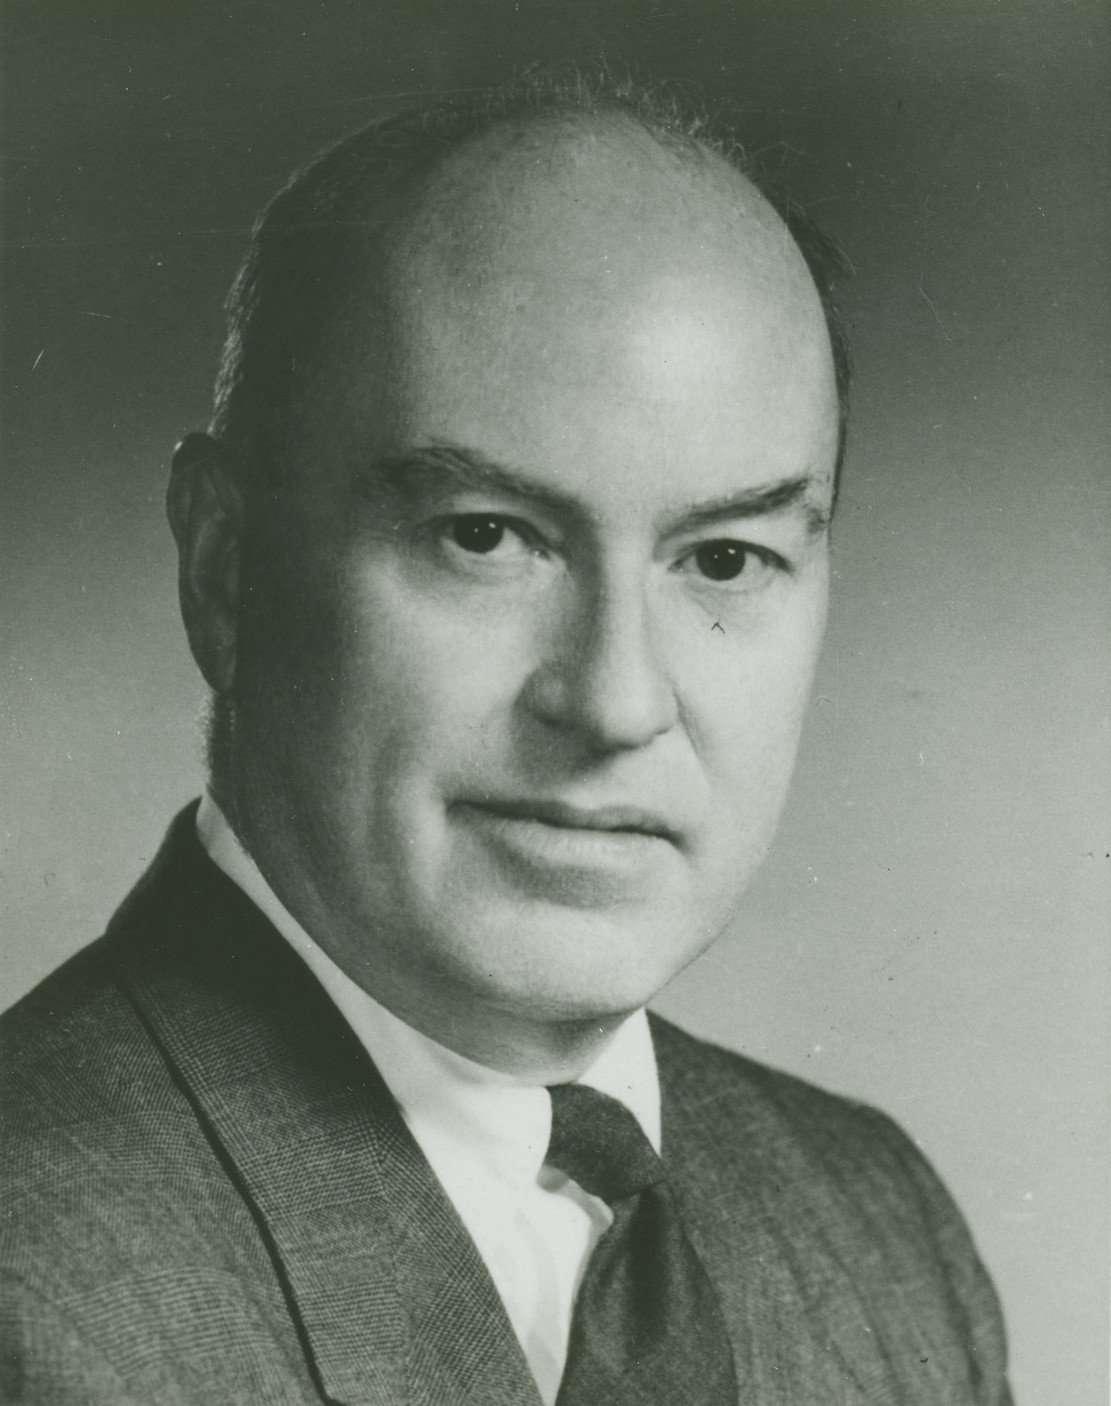 Fredson Bowers